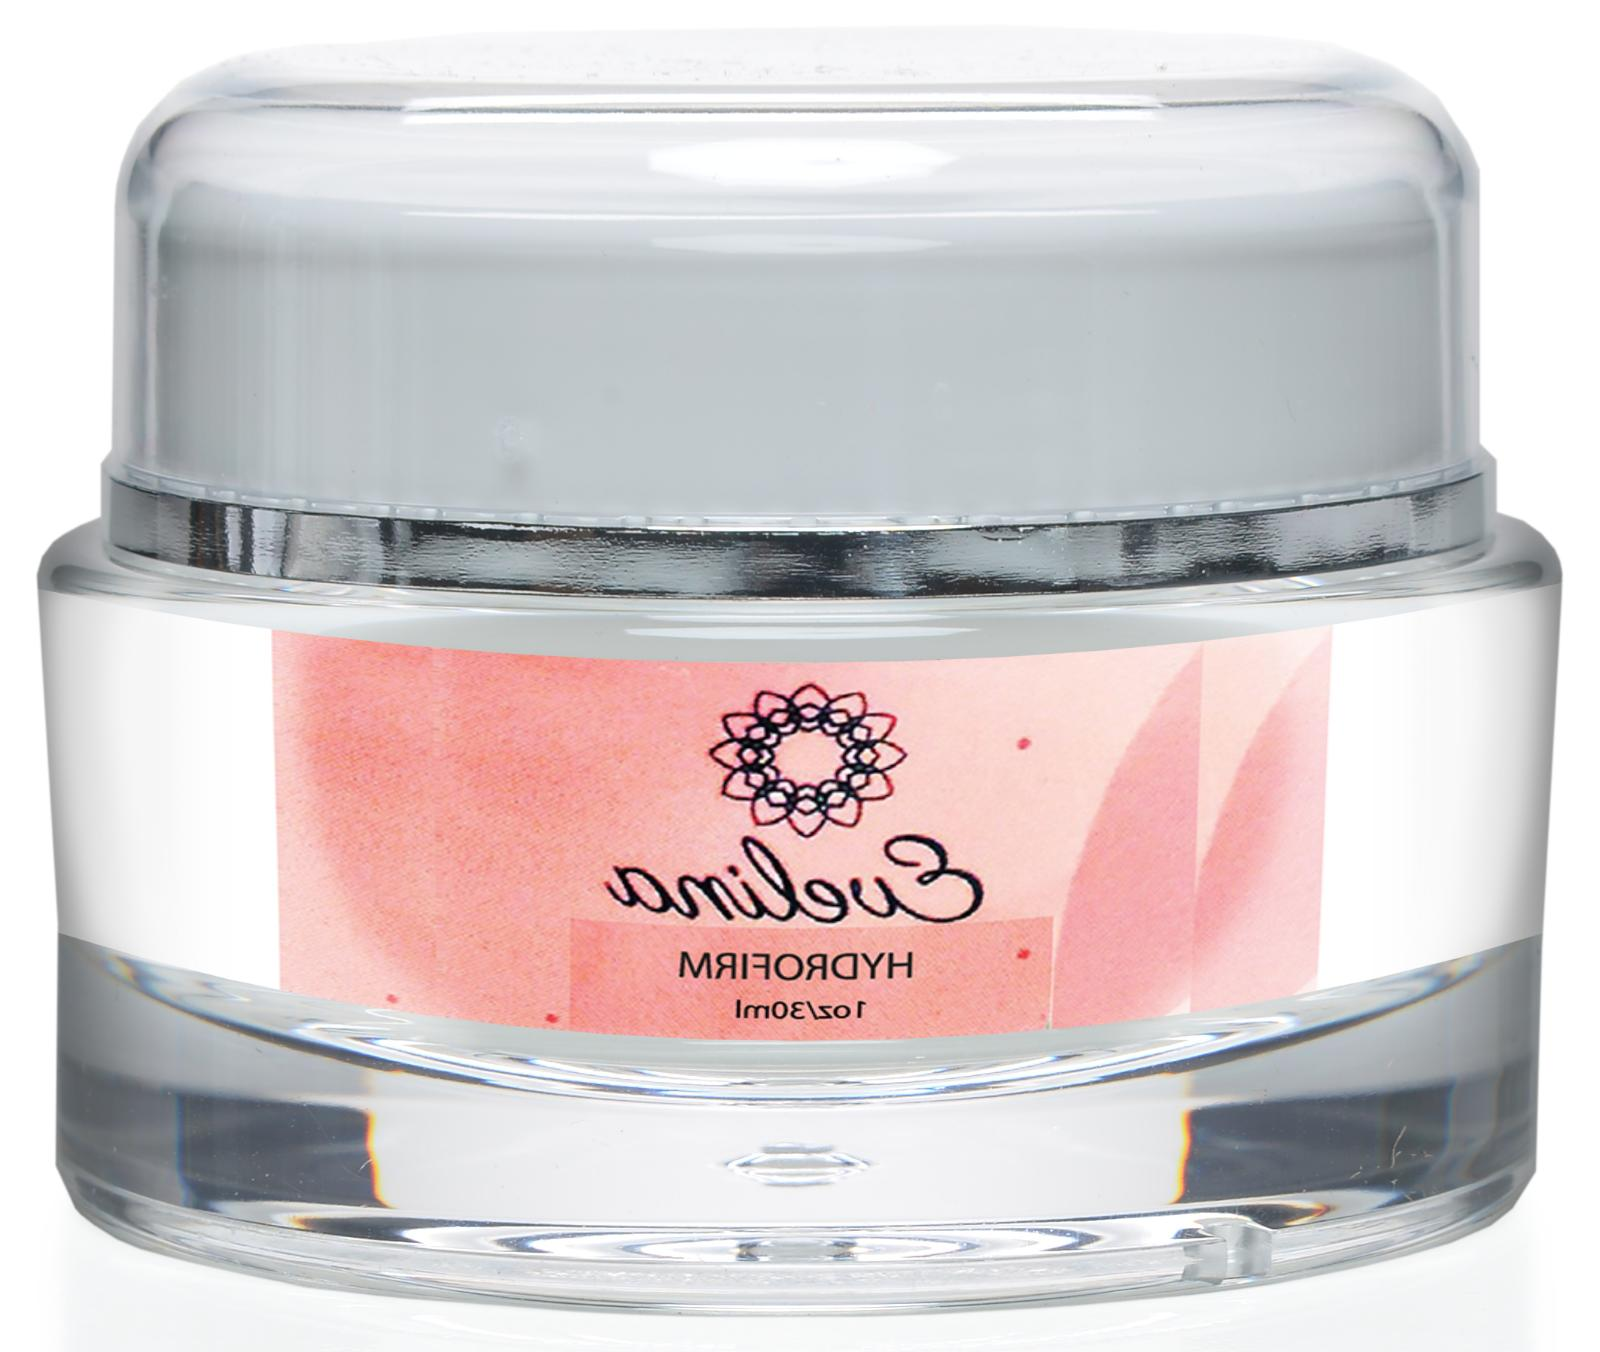 Evelina Hydrofirm - Anti-Aging Skincare -  Reduce Wrinkles a